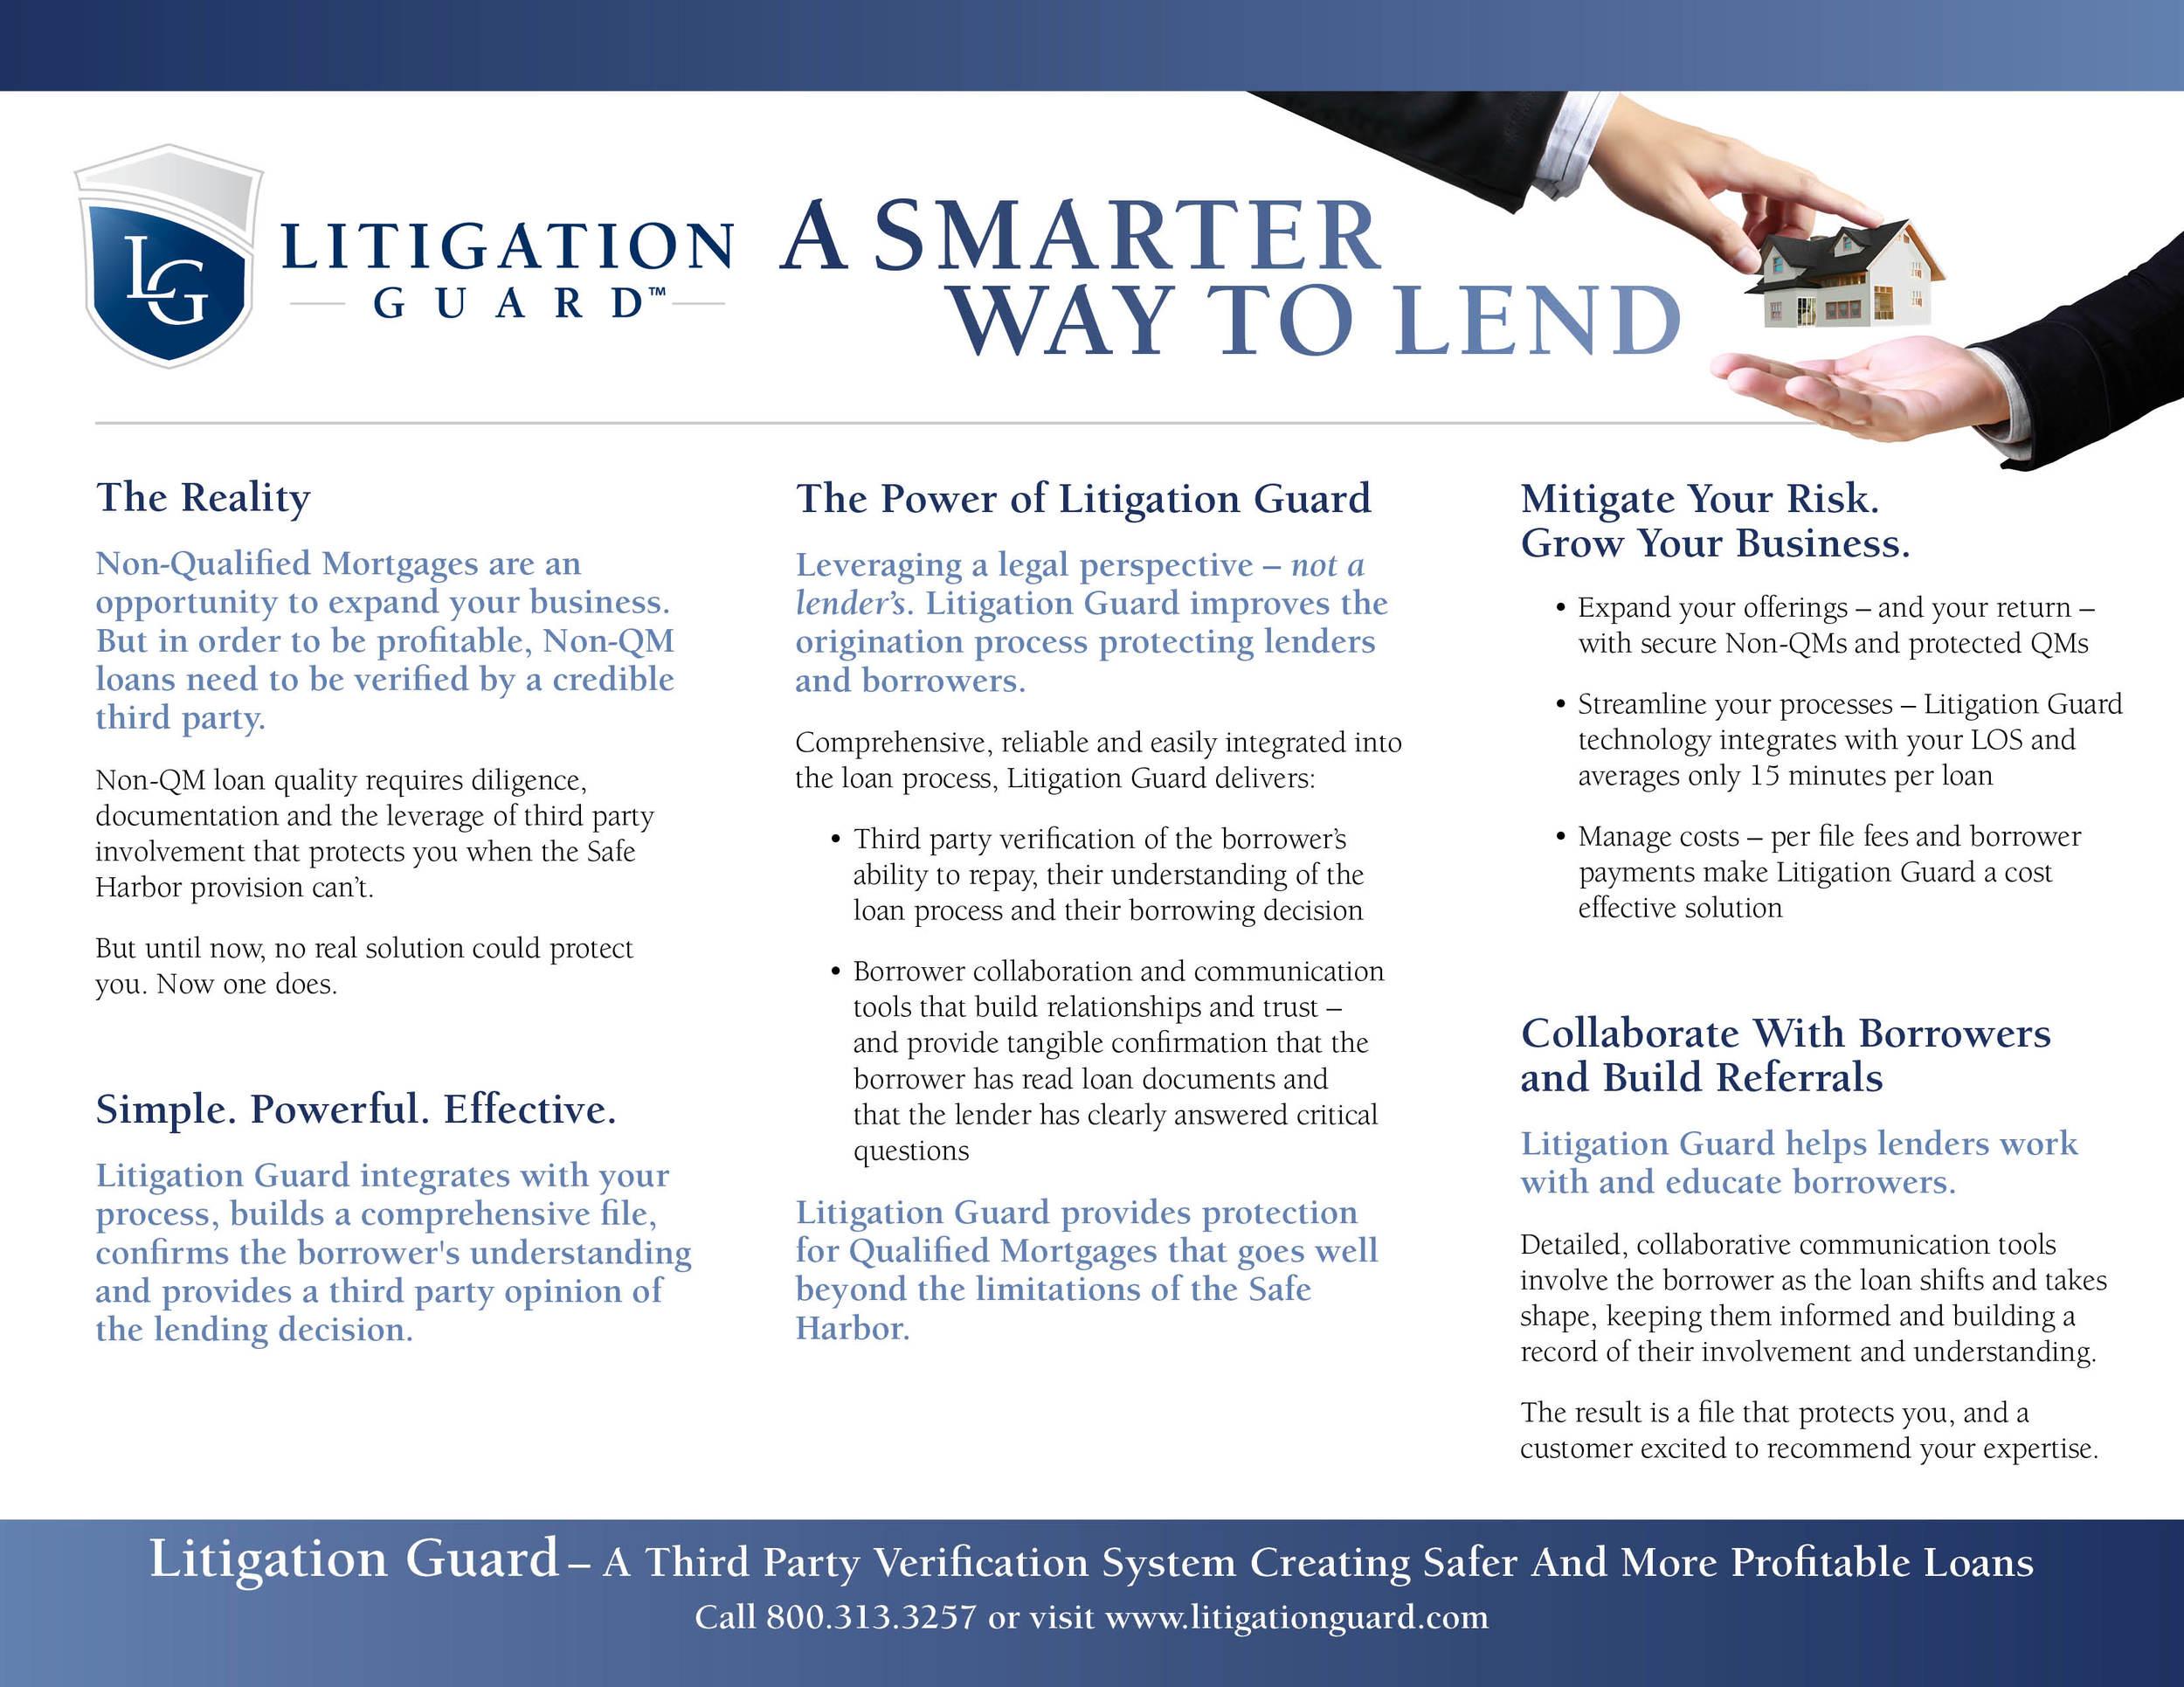 LitigationGuard_Brochure_FINAL_2.jpg